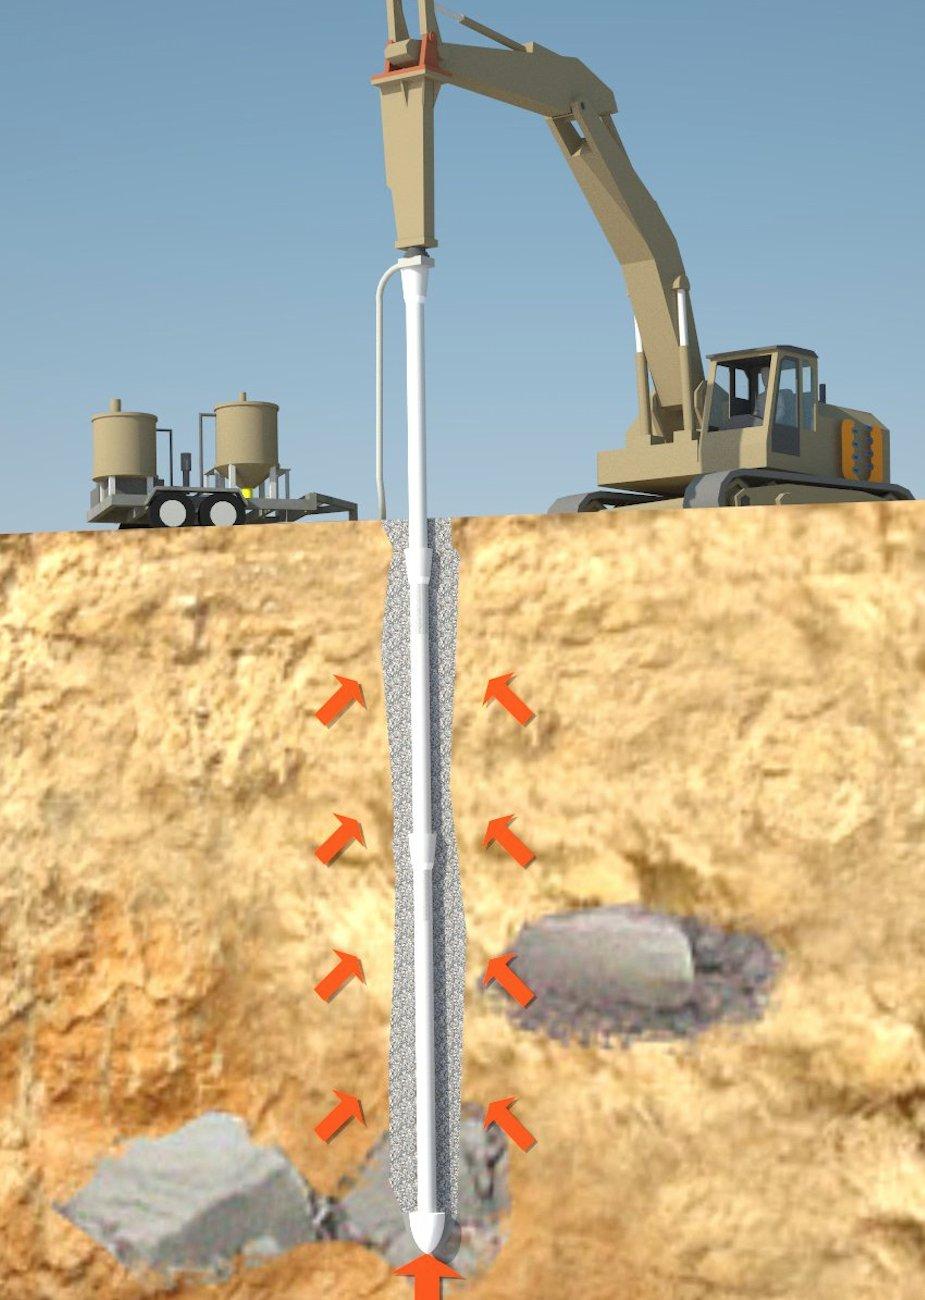 Geosolv Driven Ductile Iron Piles